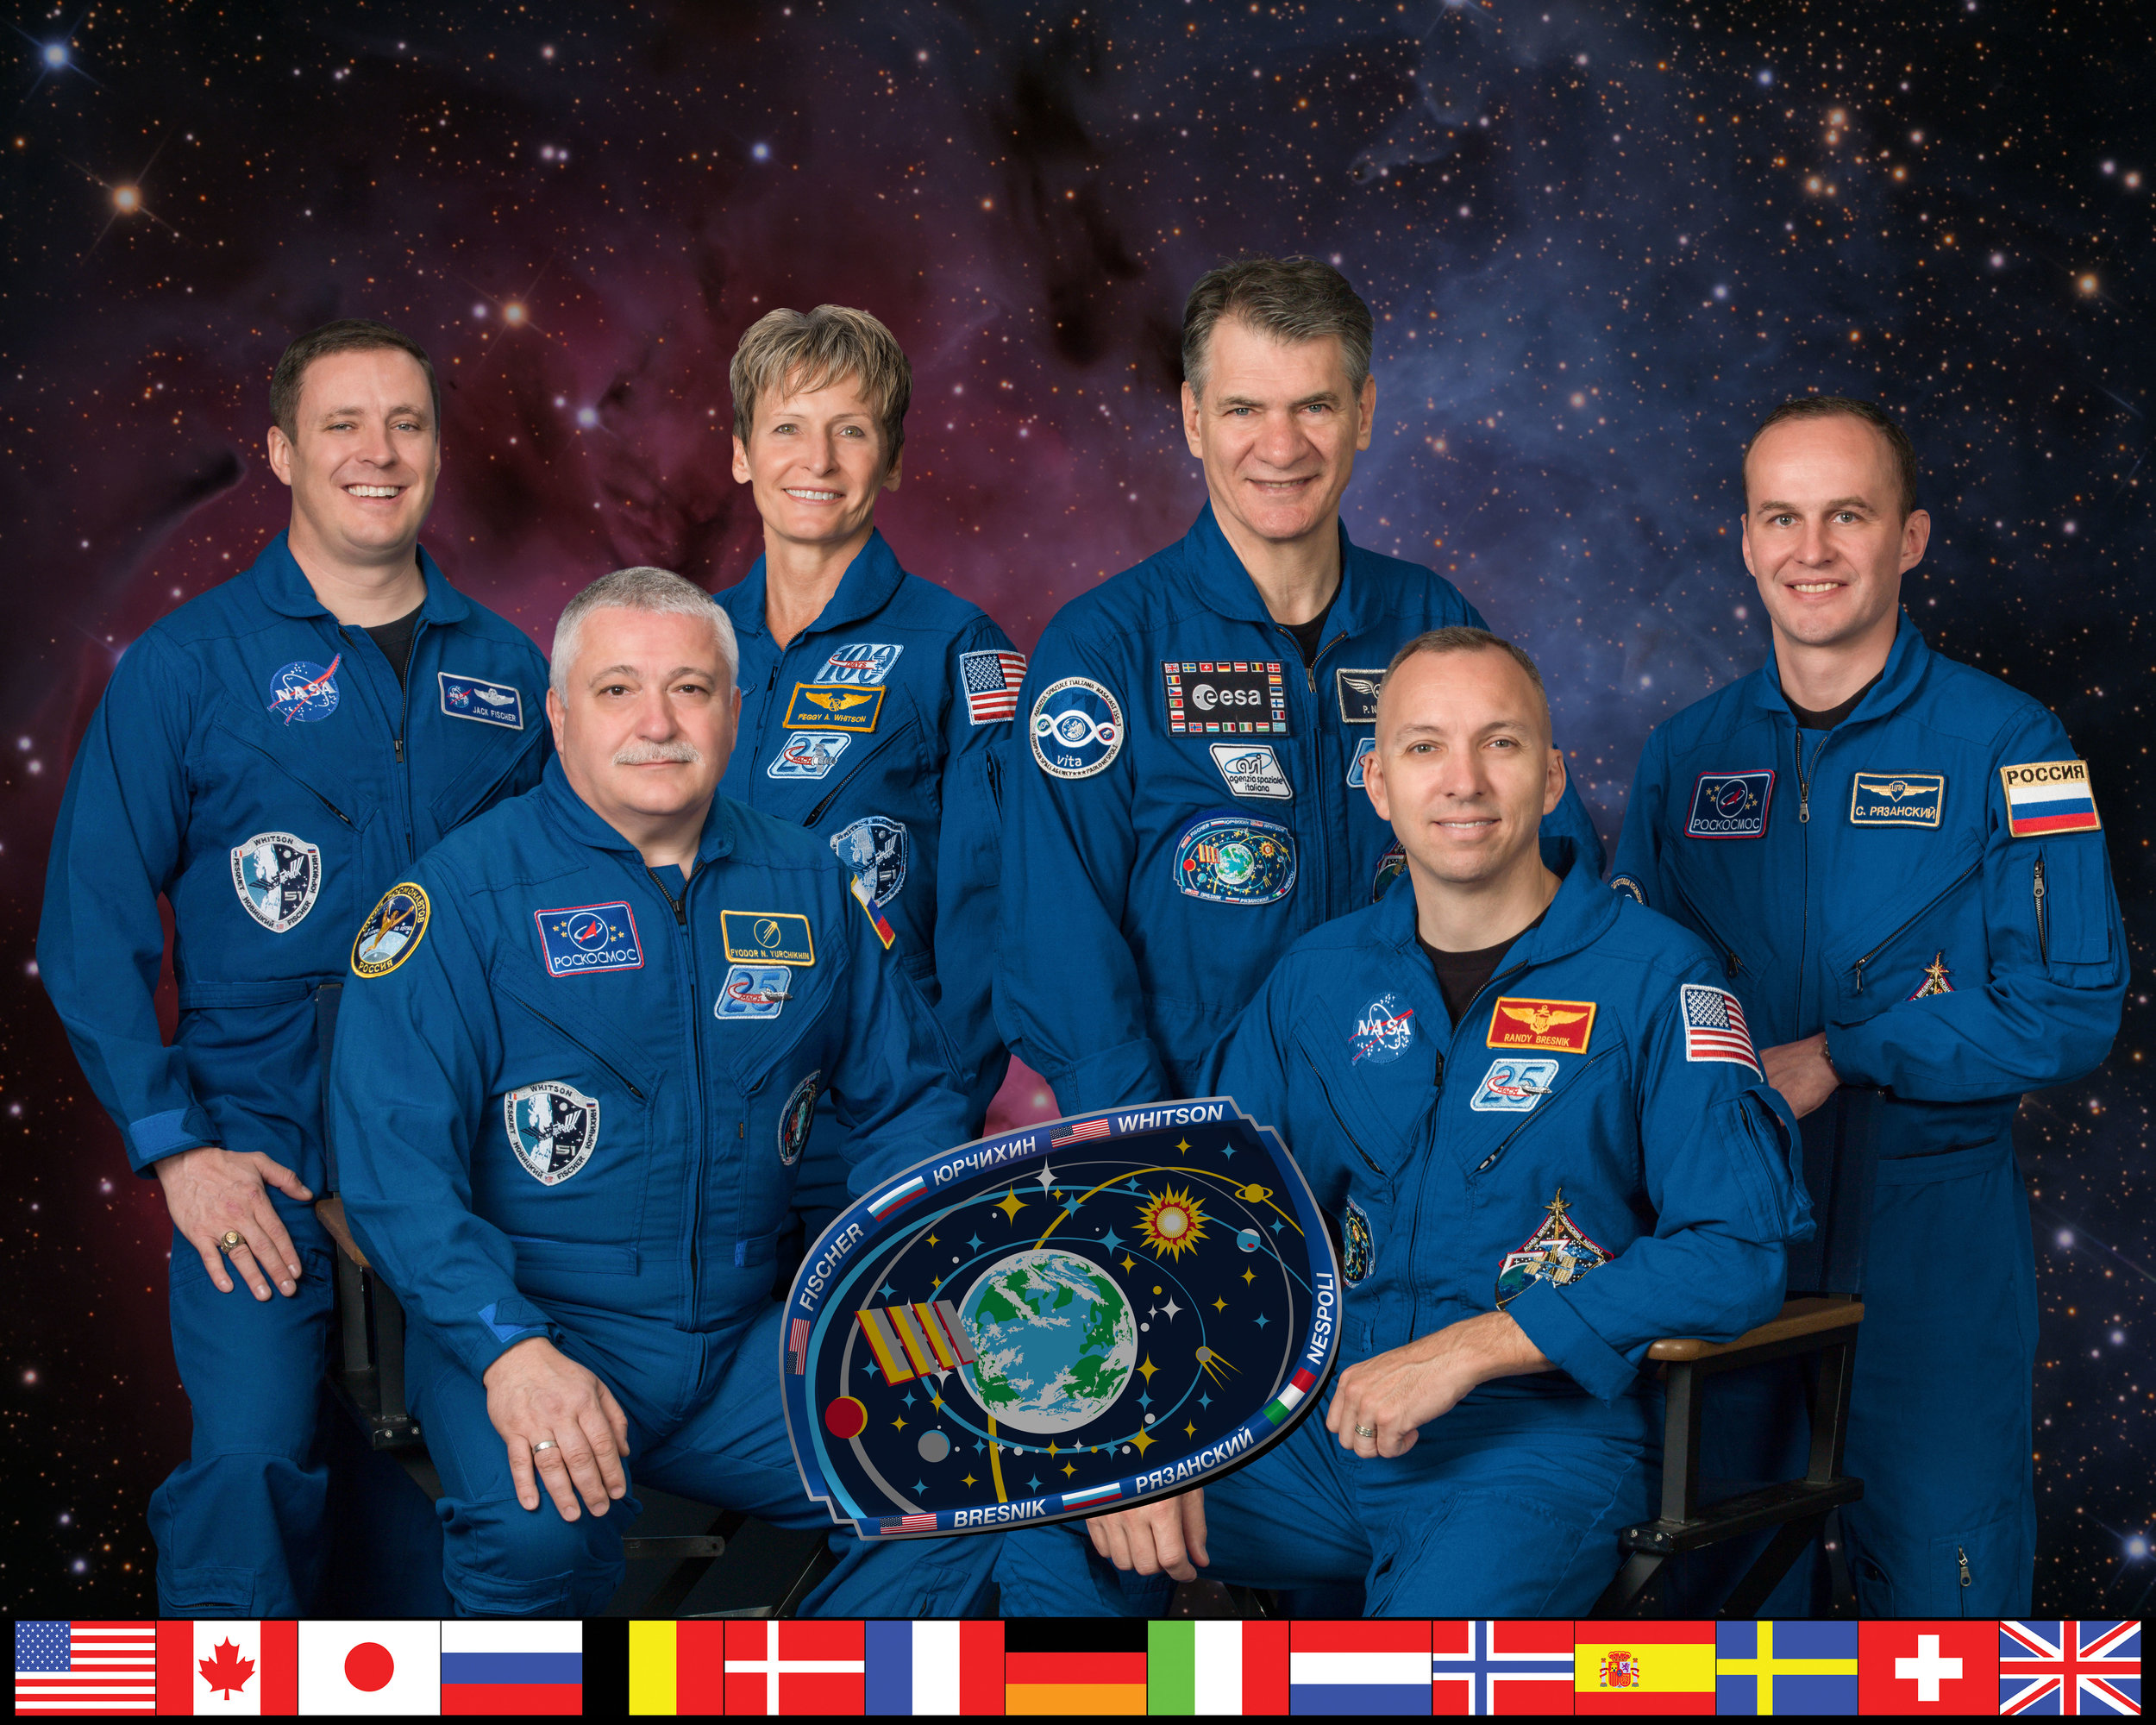 Expedition_52_crew_portrait.jpg